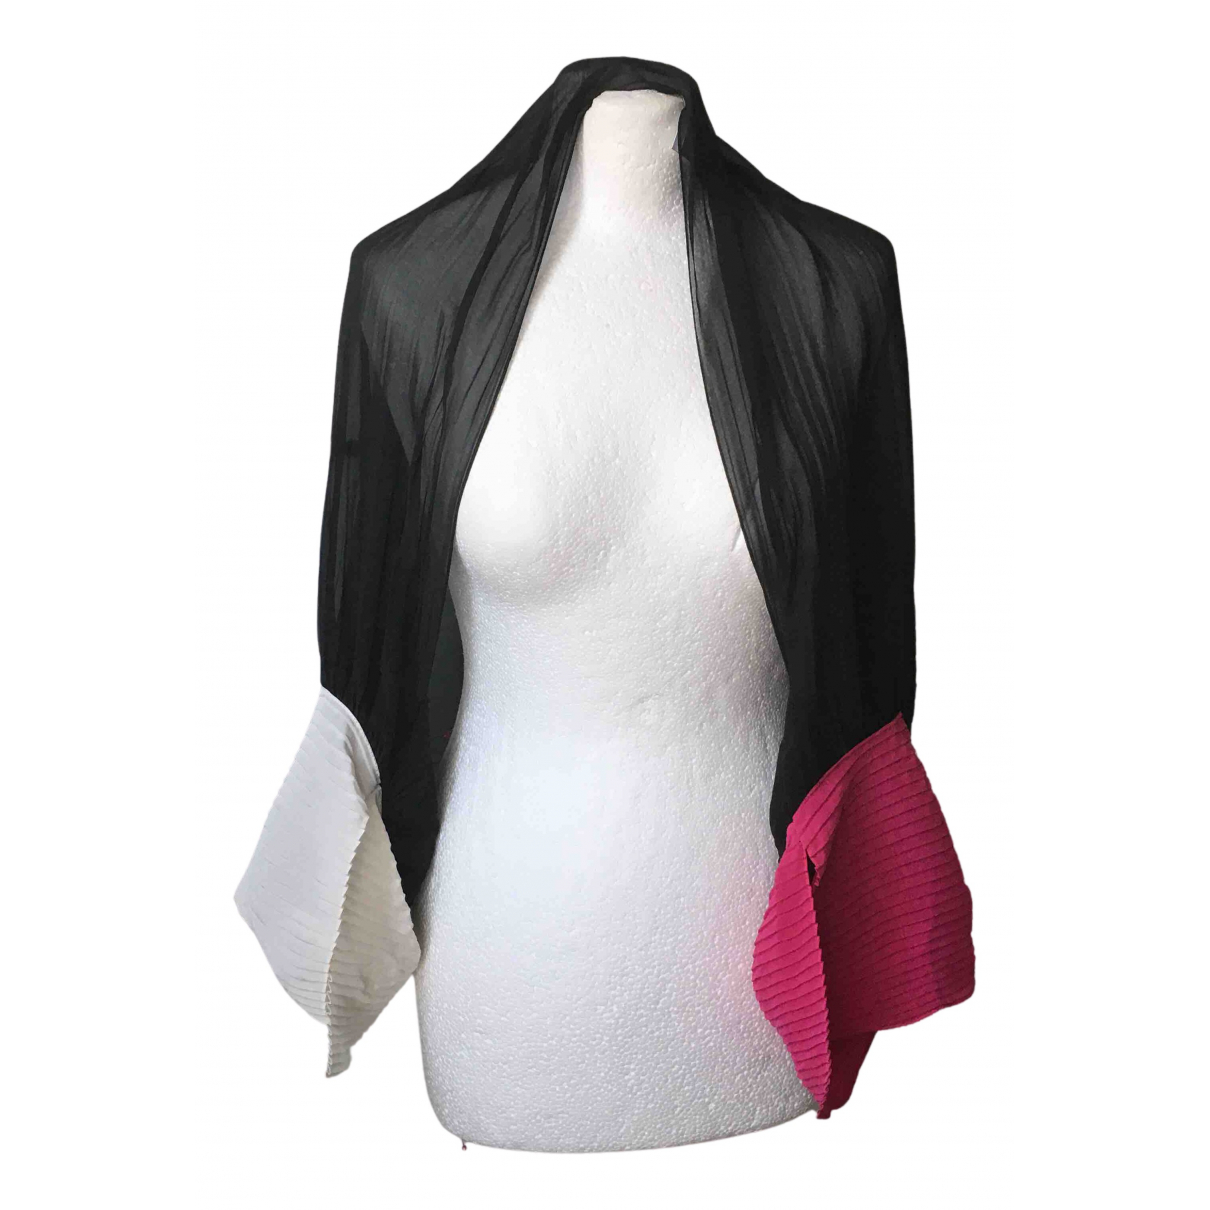 Giorgio Armani - Veste   pour femme en soie - multicolore